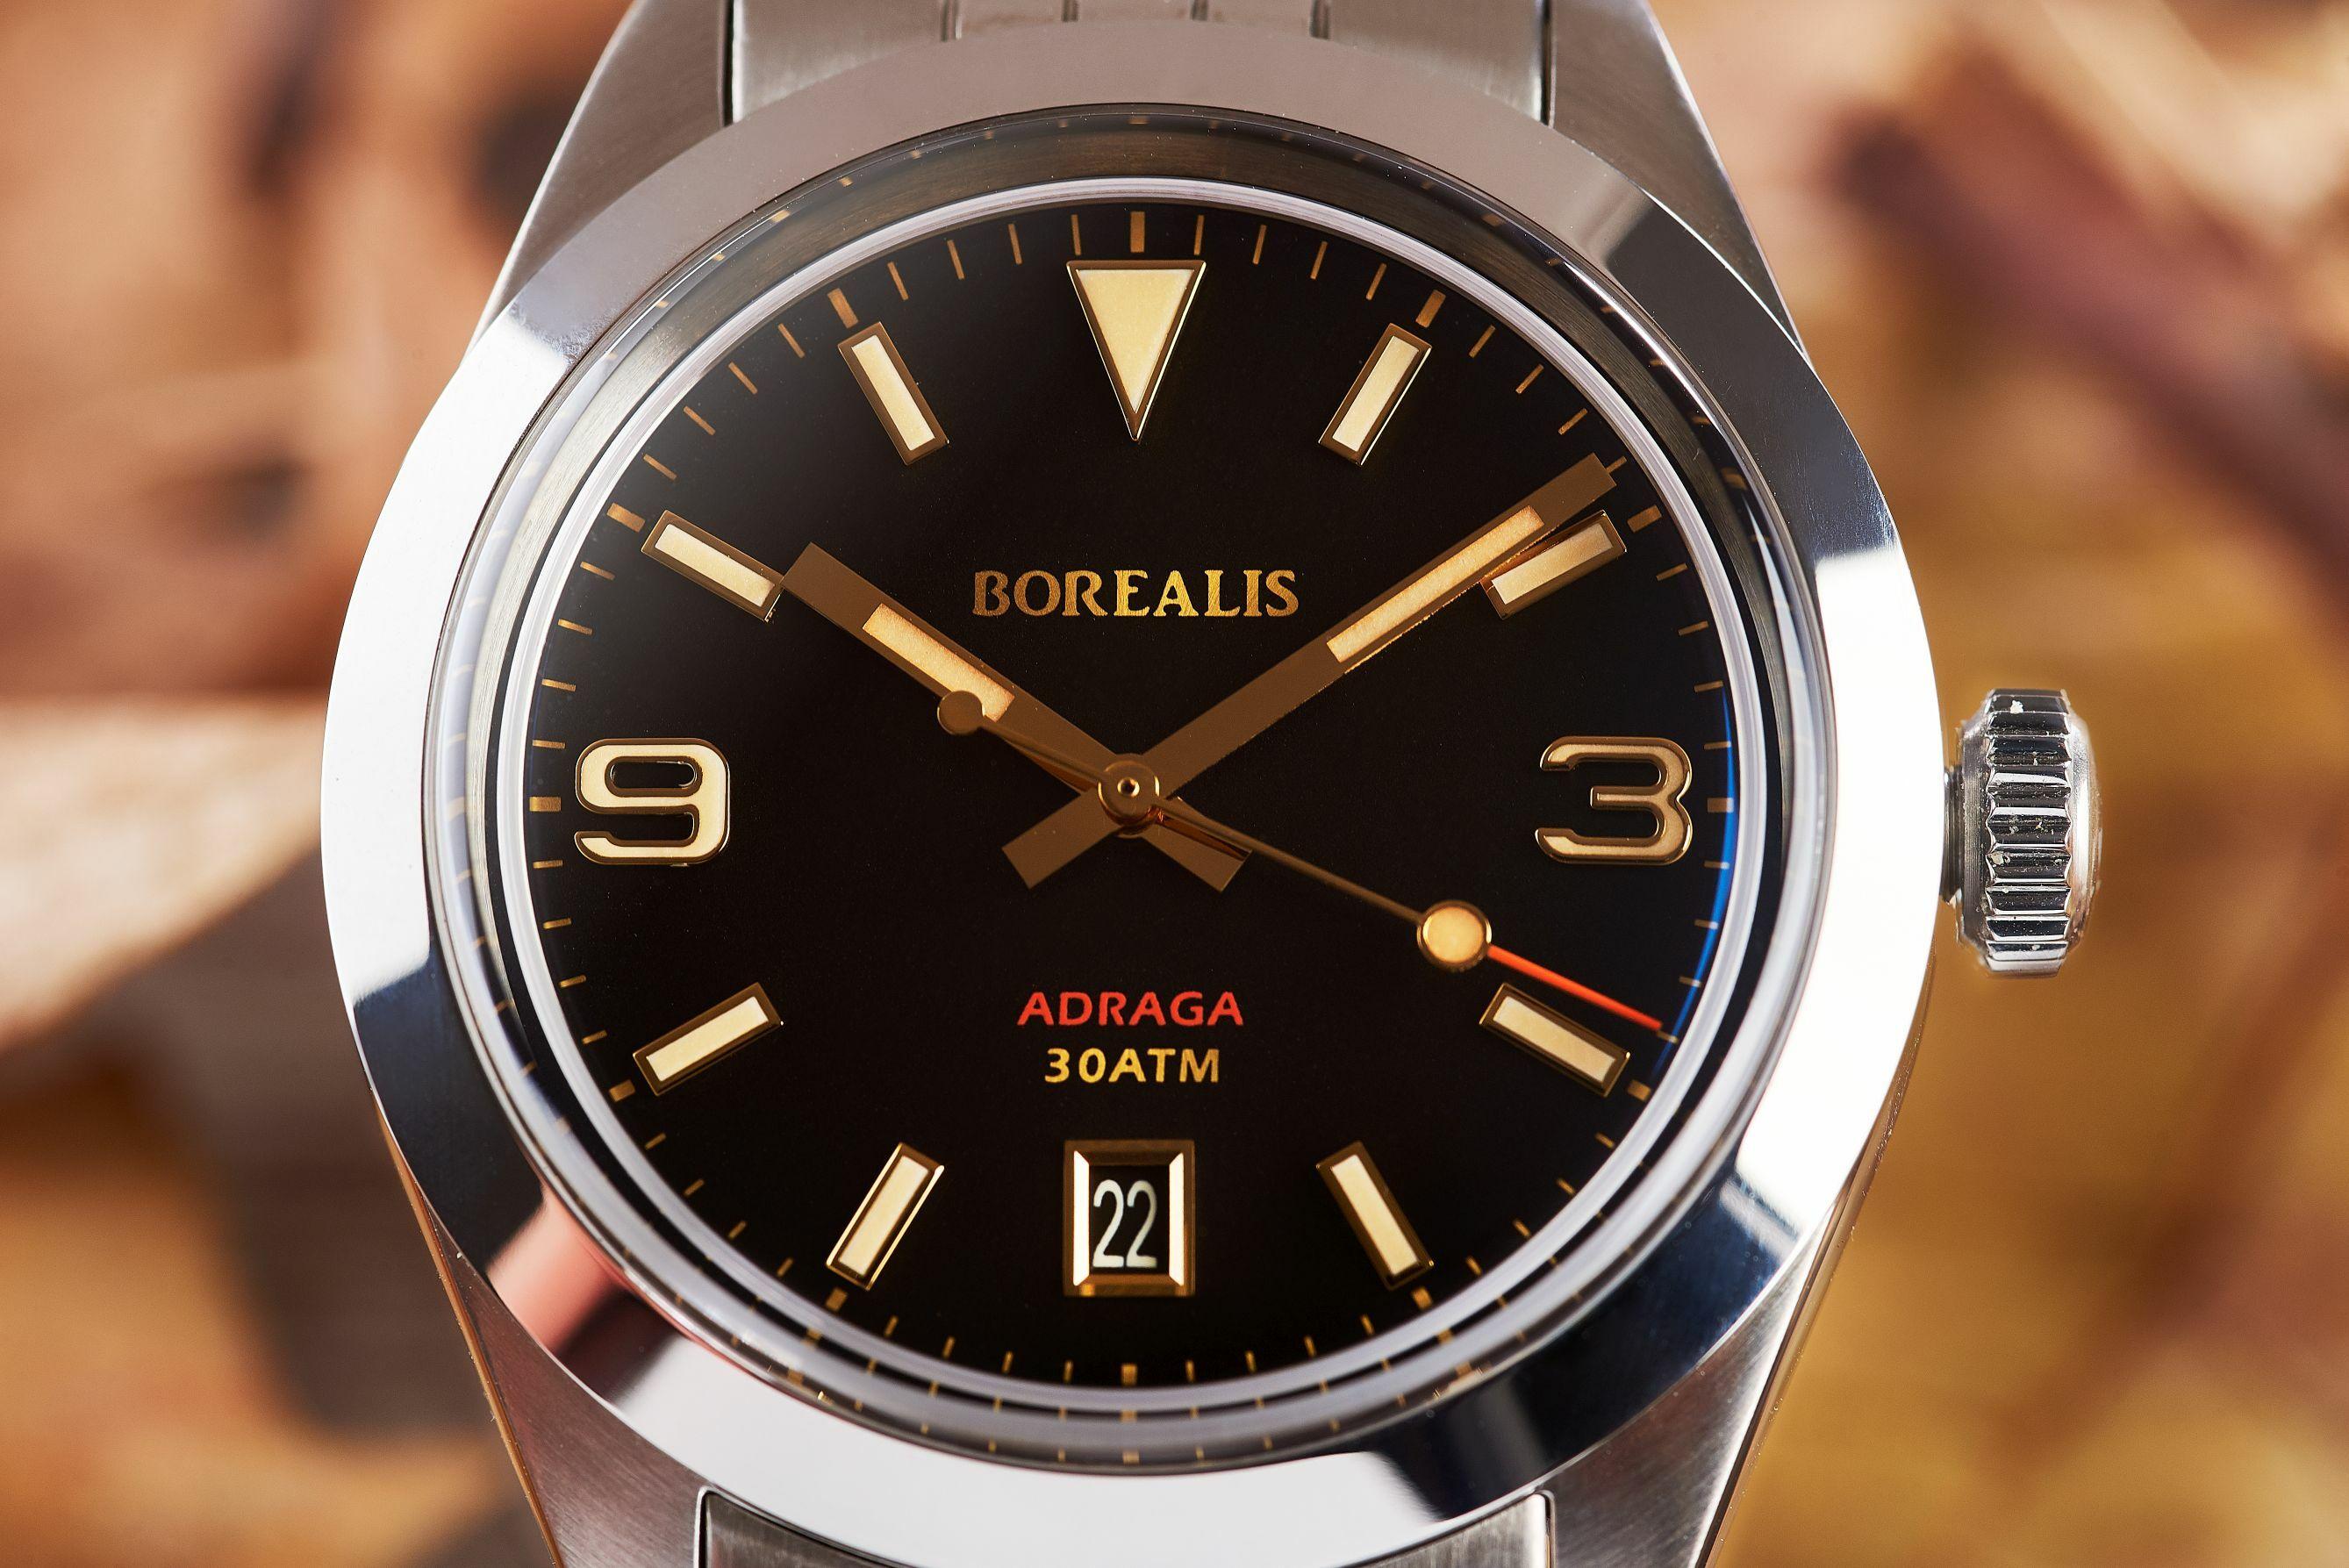 Borealis Adraga Stainless Steel Miyota 9015 black dial Commando Hands Date Old Radium Lume ADRAGA2AB1